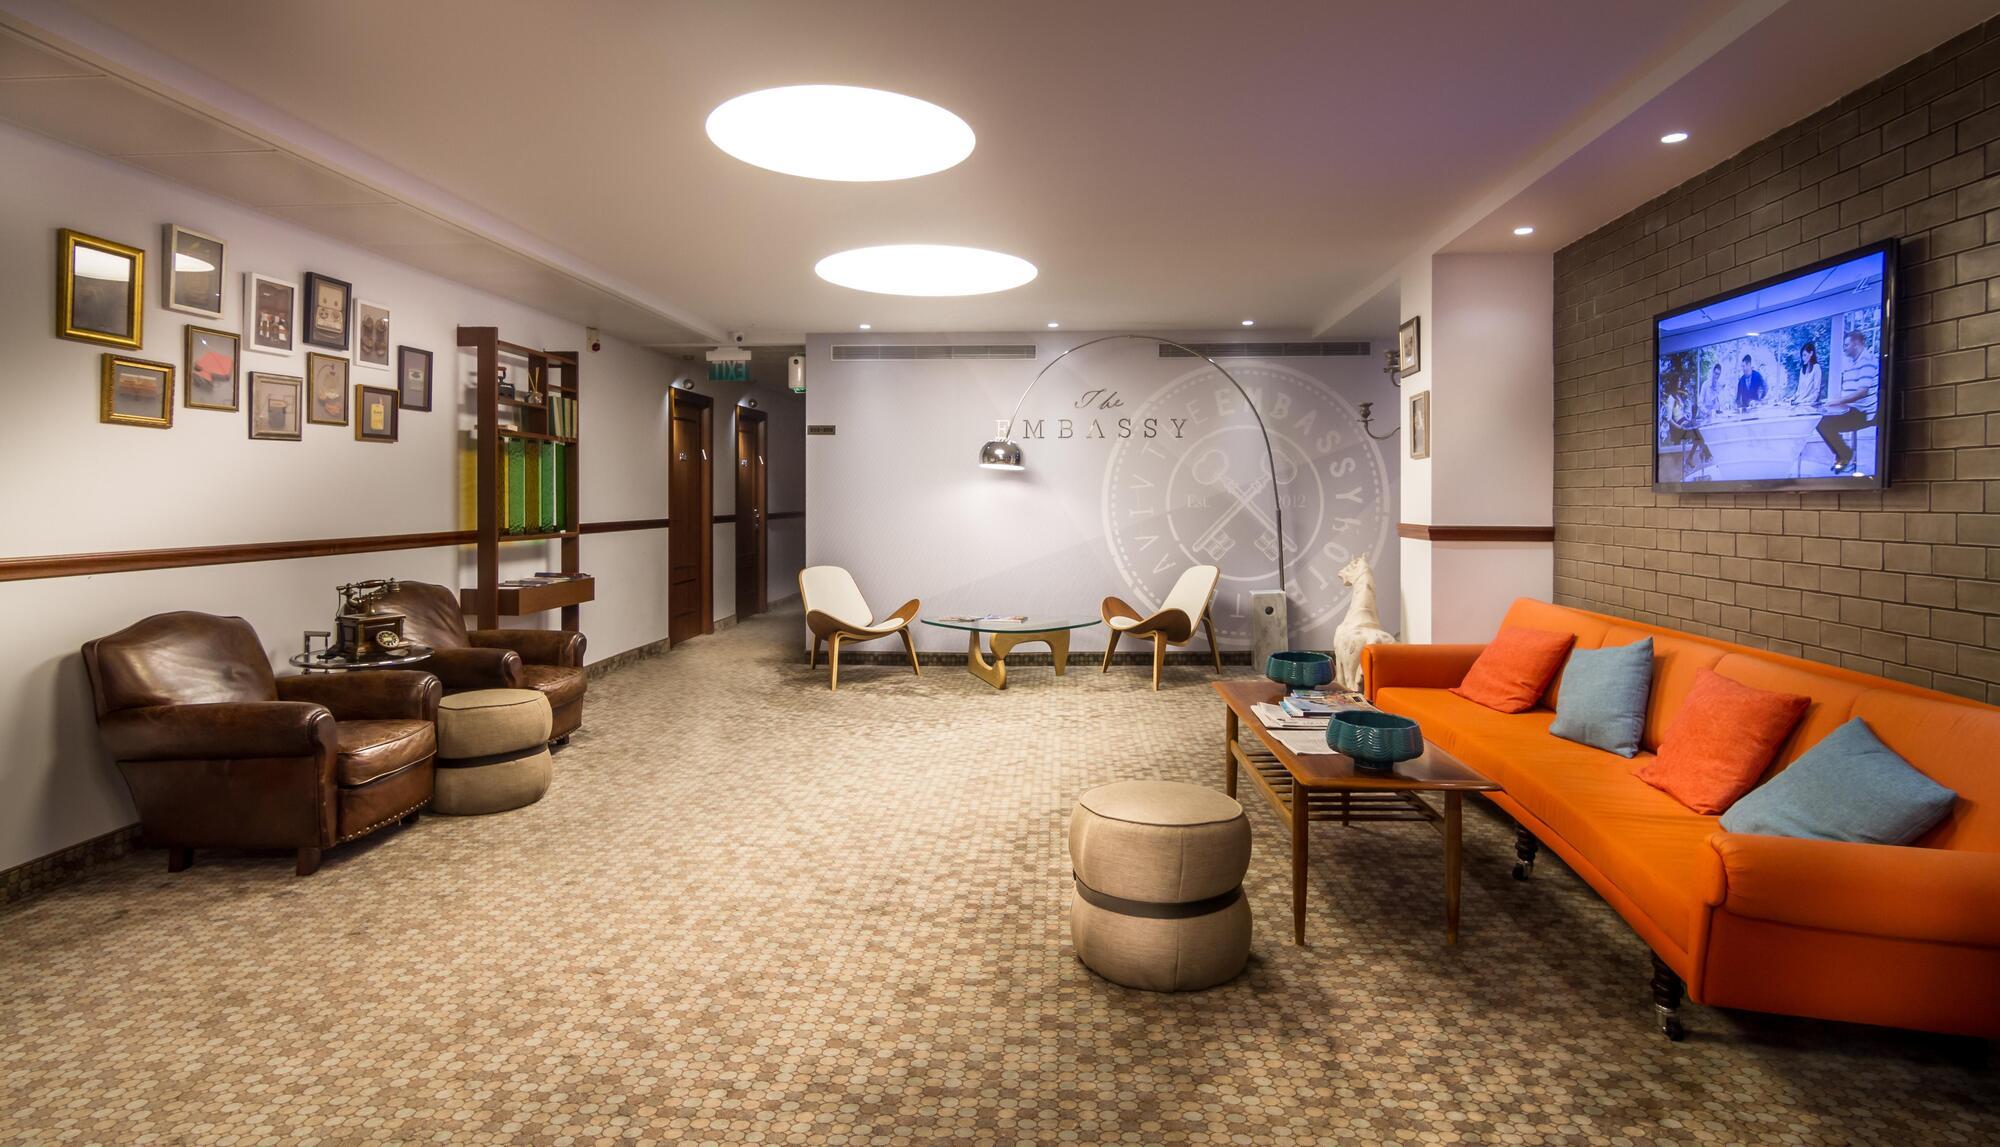 Embassy Hotel Tel Aviv Image 16